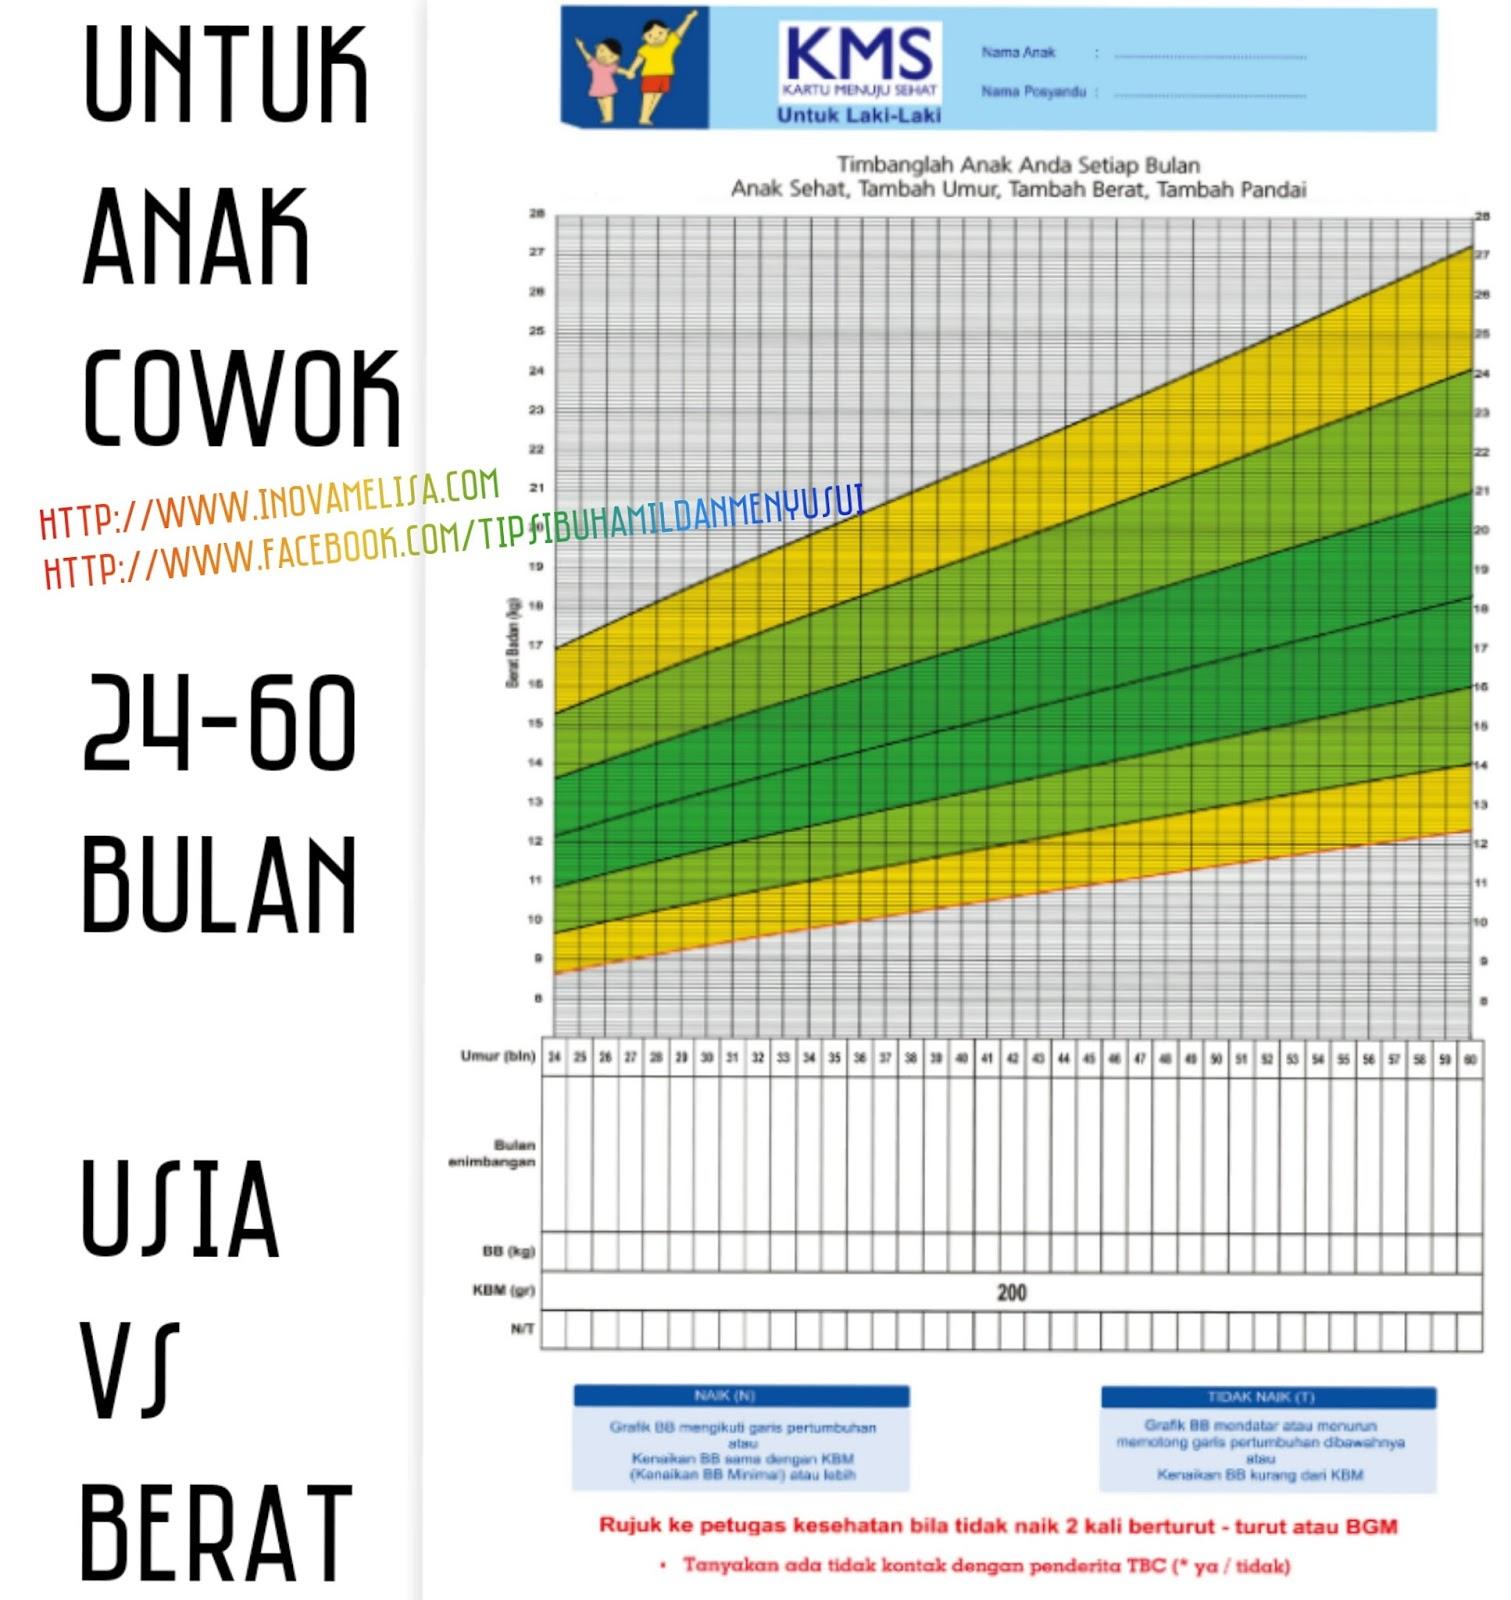 Latihan Soal USM STIS 2017/2018 + Pembahasan Lengkap